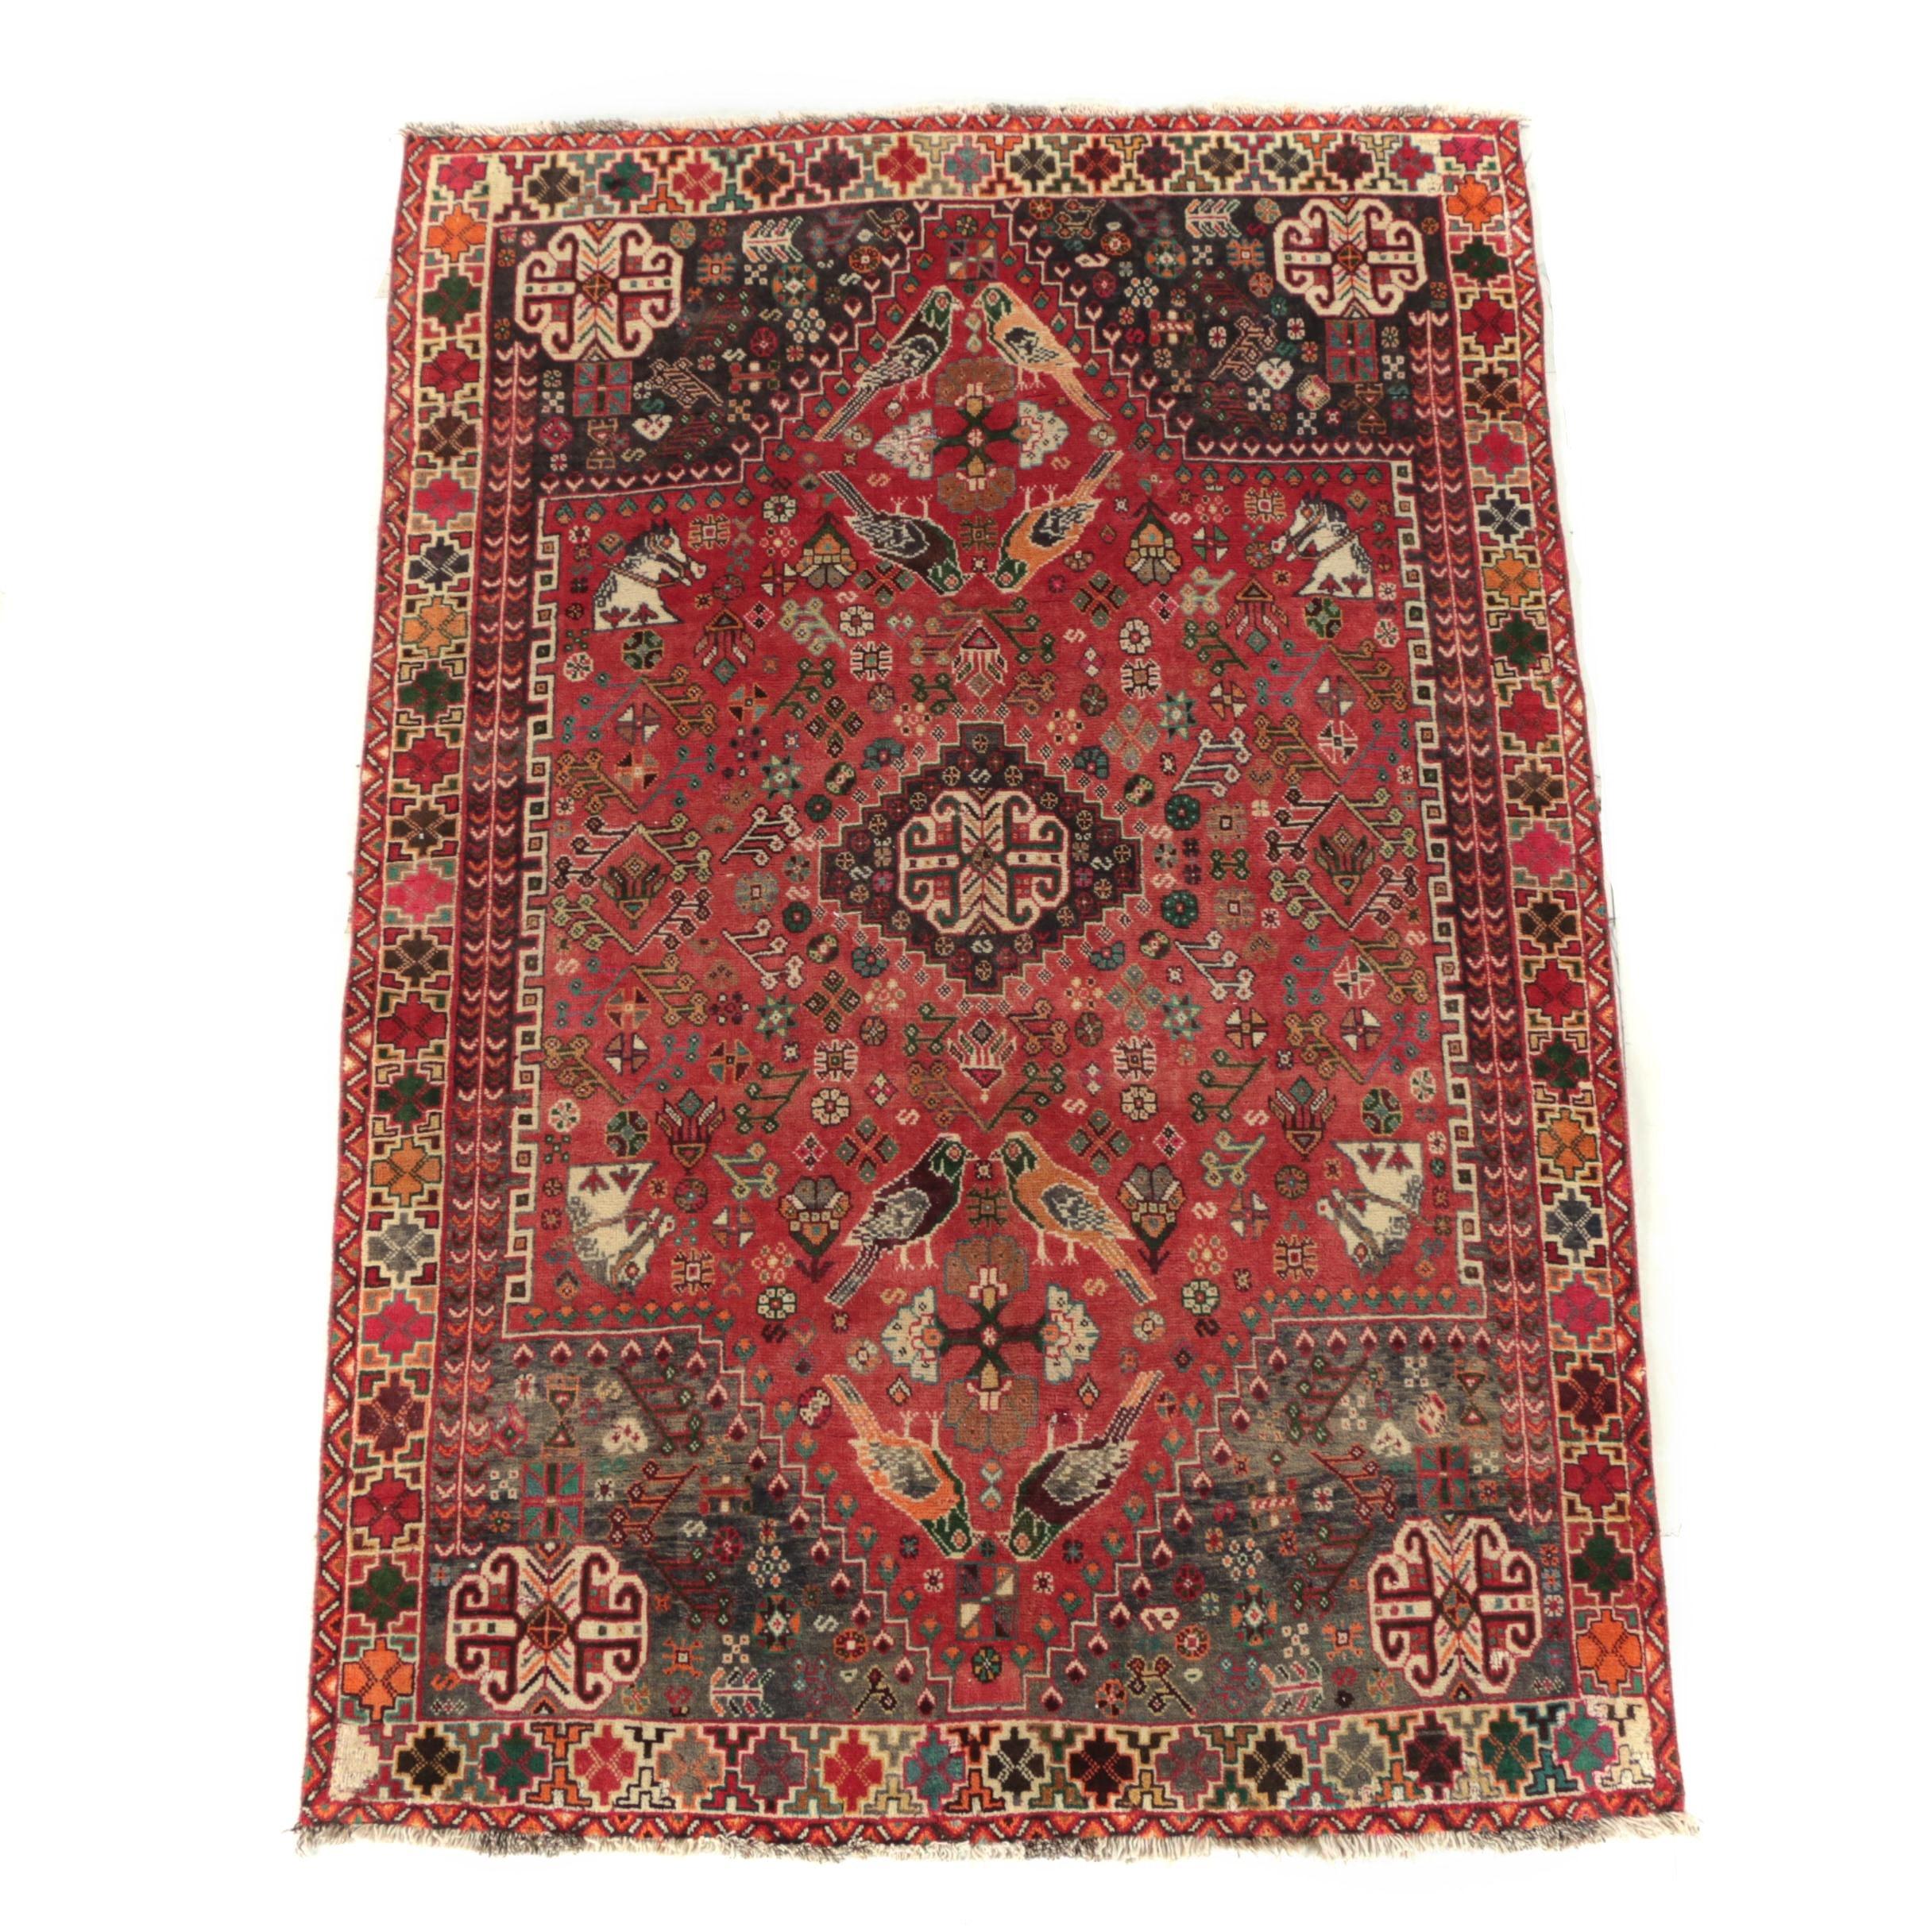 Hand-Knotted Persian Qashqai Wool Rug